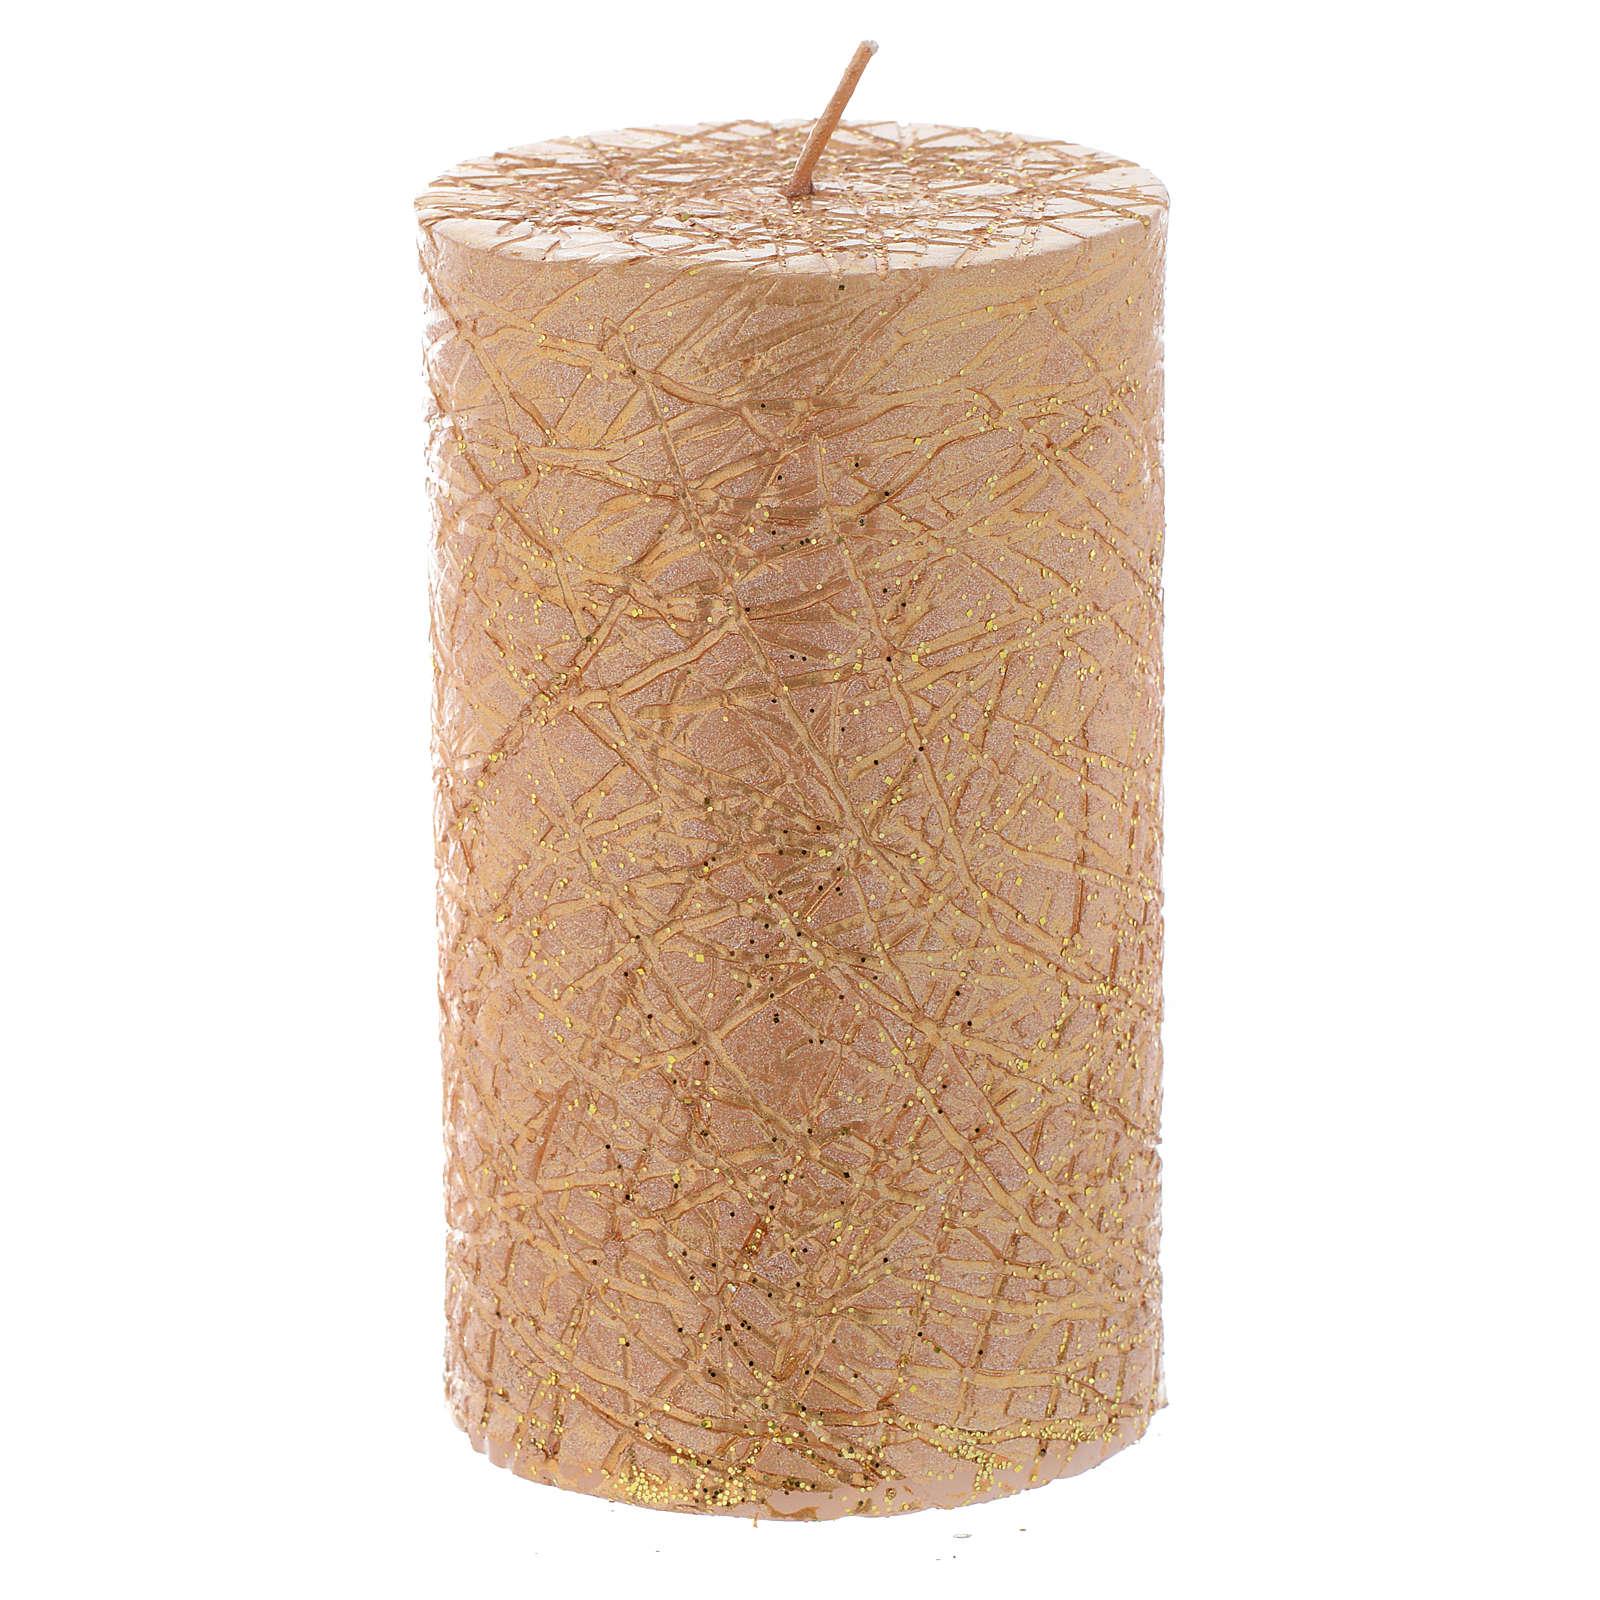 Bougie Noël Comet cylindre 10x6 cm dorée 3